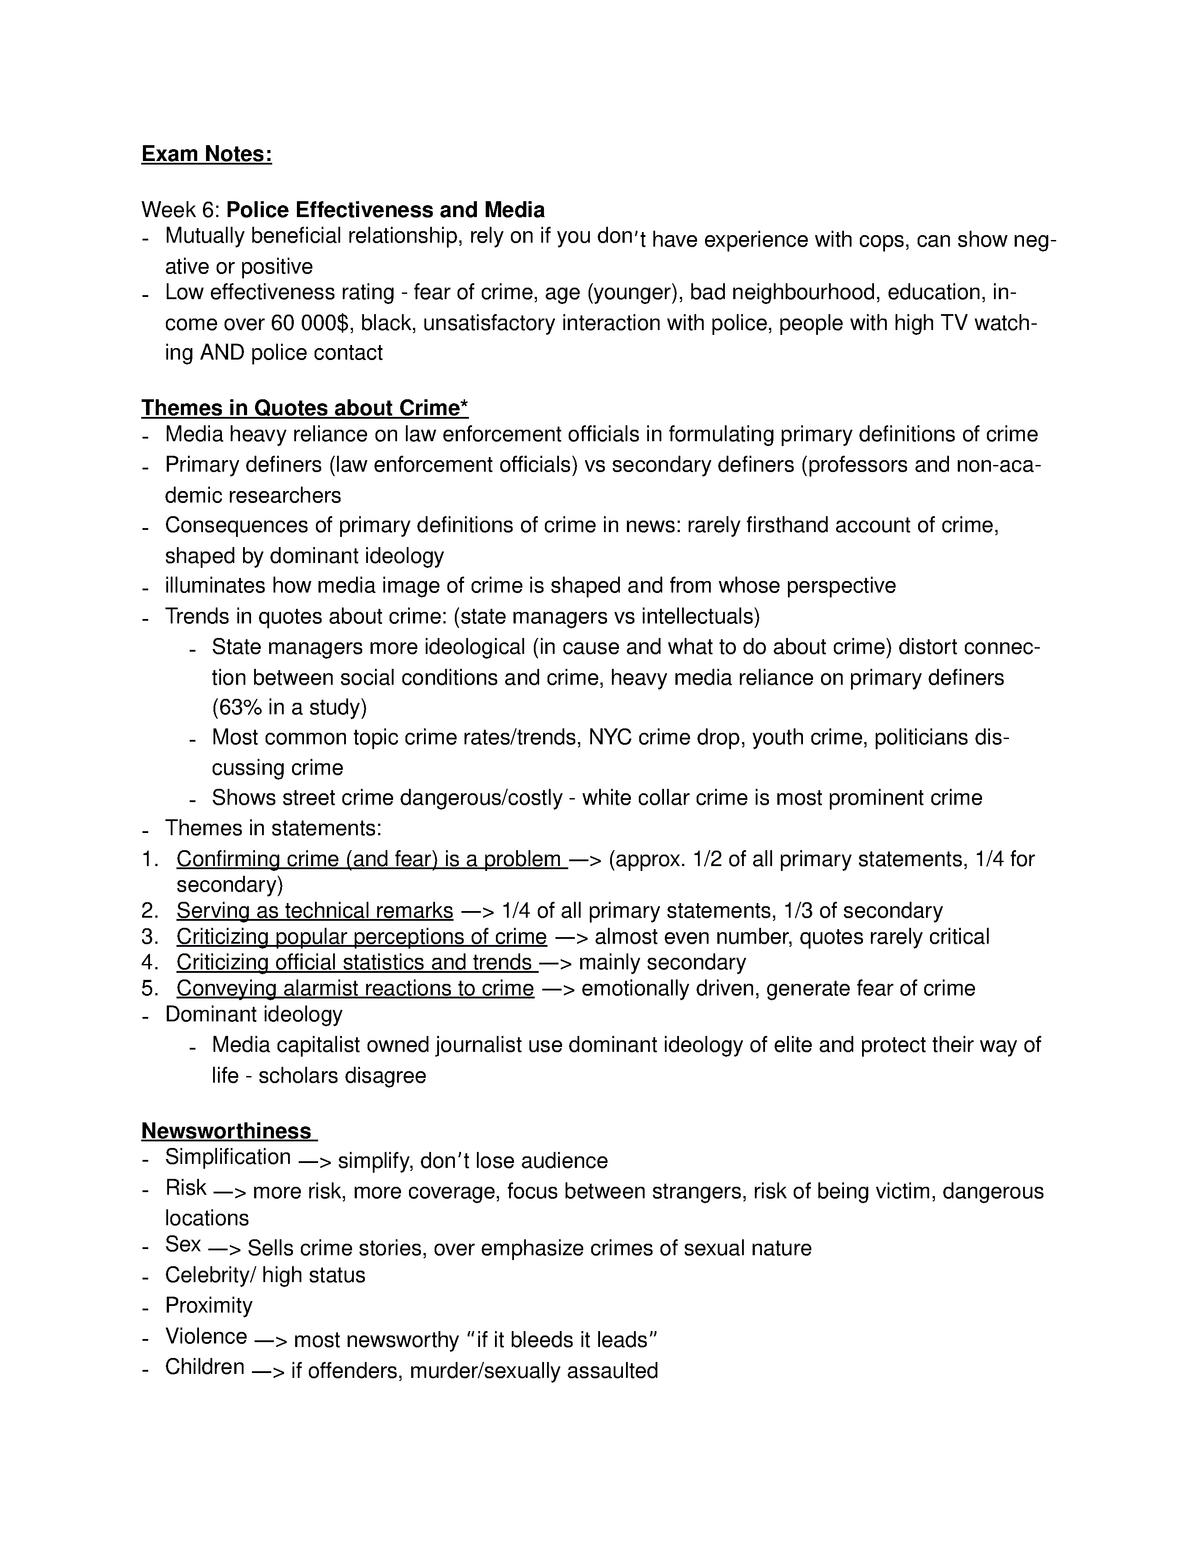 Police and Society Exam Notes - Soc3750: Police in Society